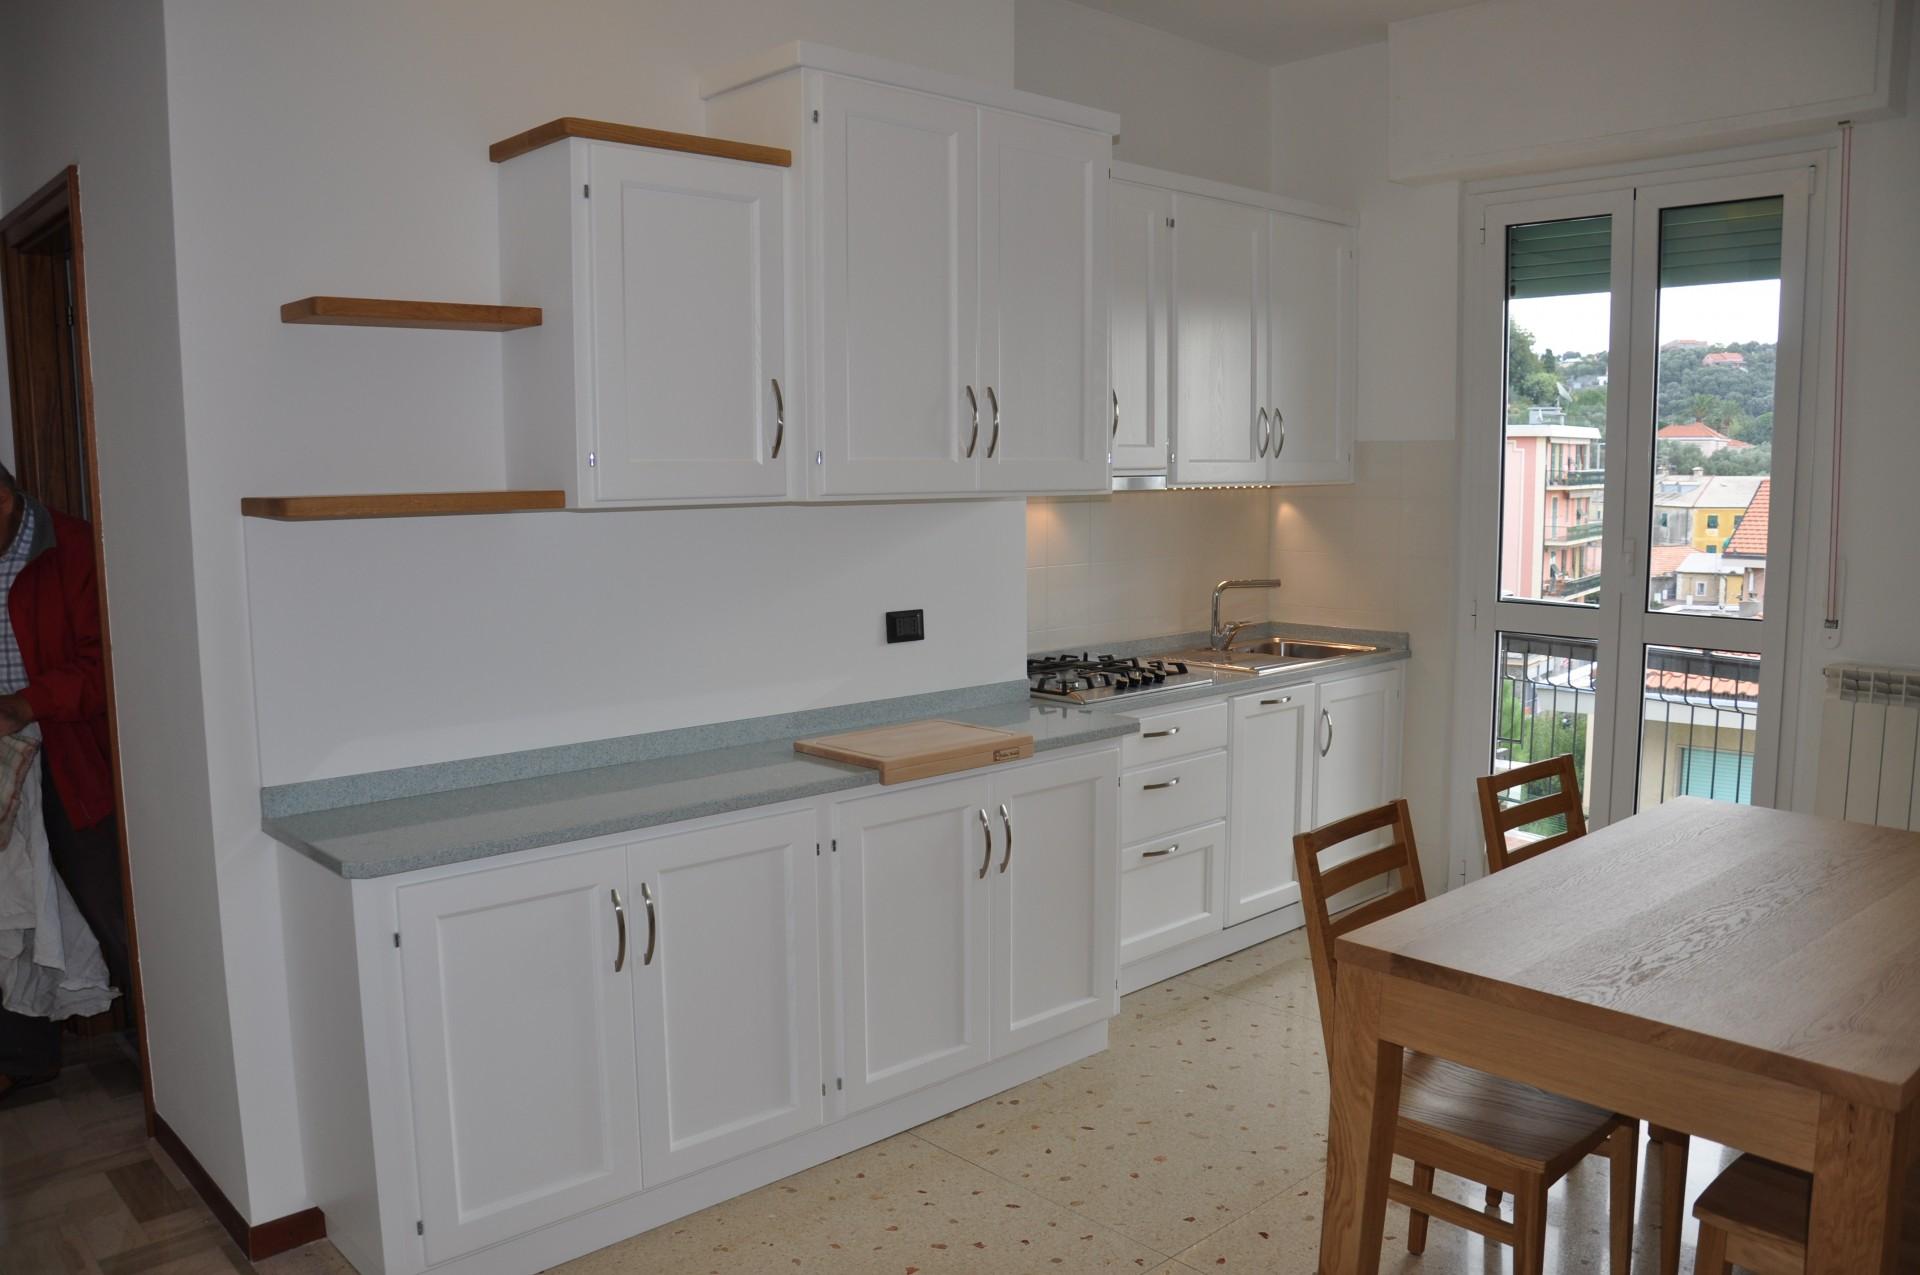 cucine moderne su misura roma | madgeweb.com idee di interior design - Mobili Moderni Su Misura Roma